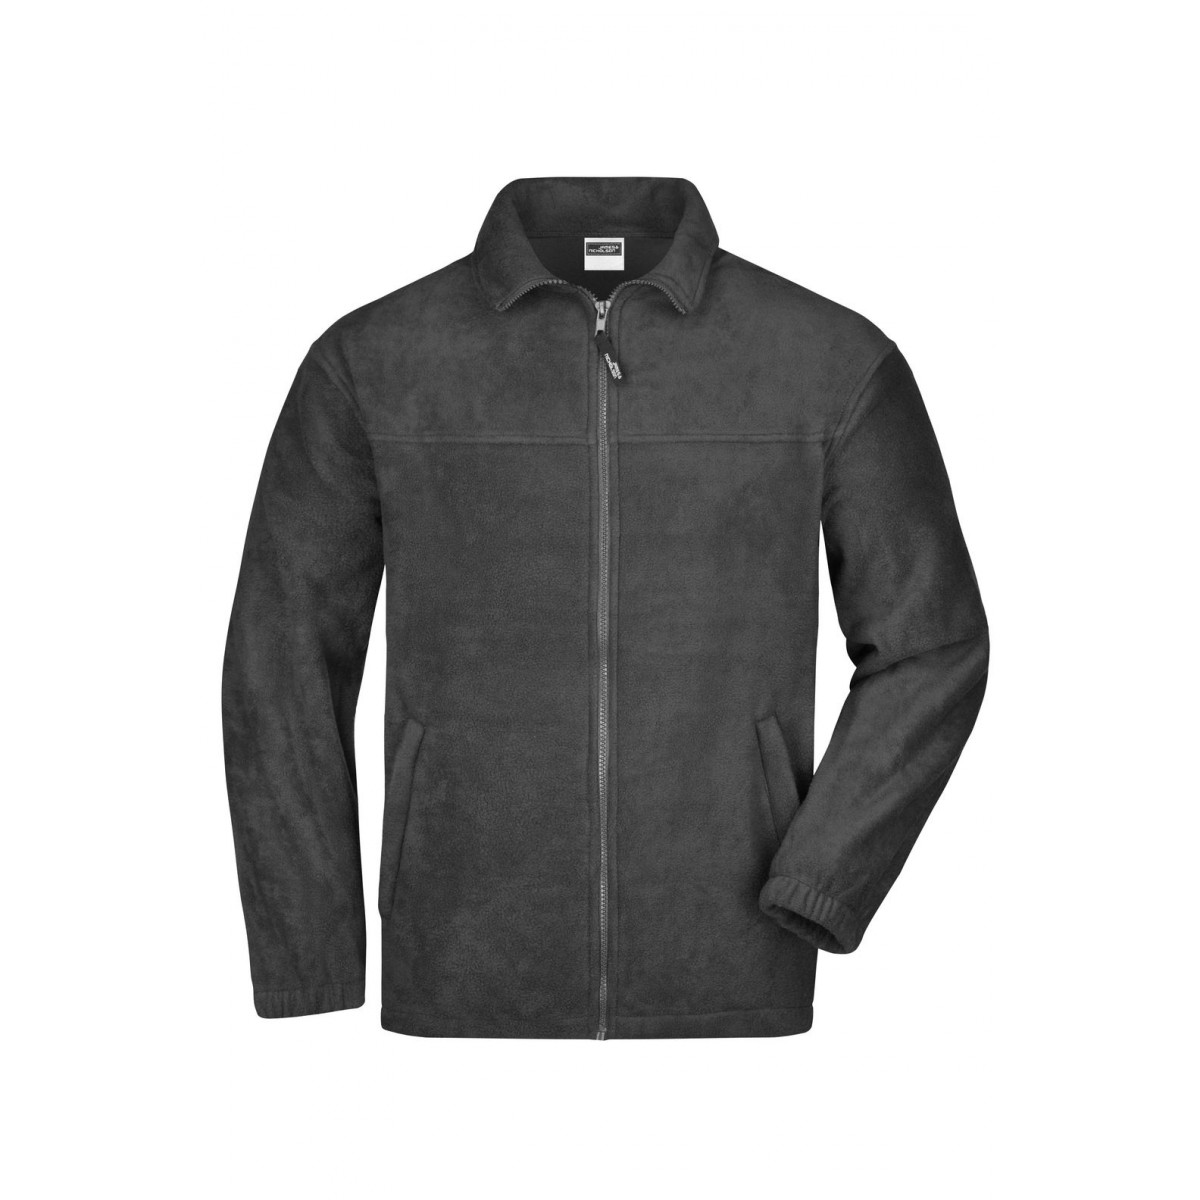 Толстовка мужская JN044 Full-Zip Fleece - Темно-серый